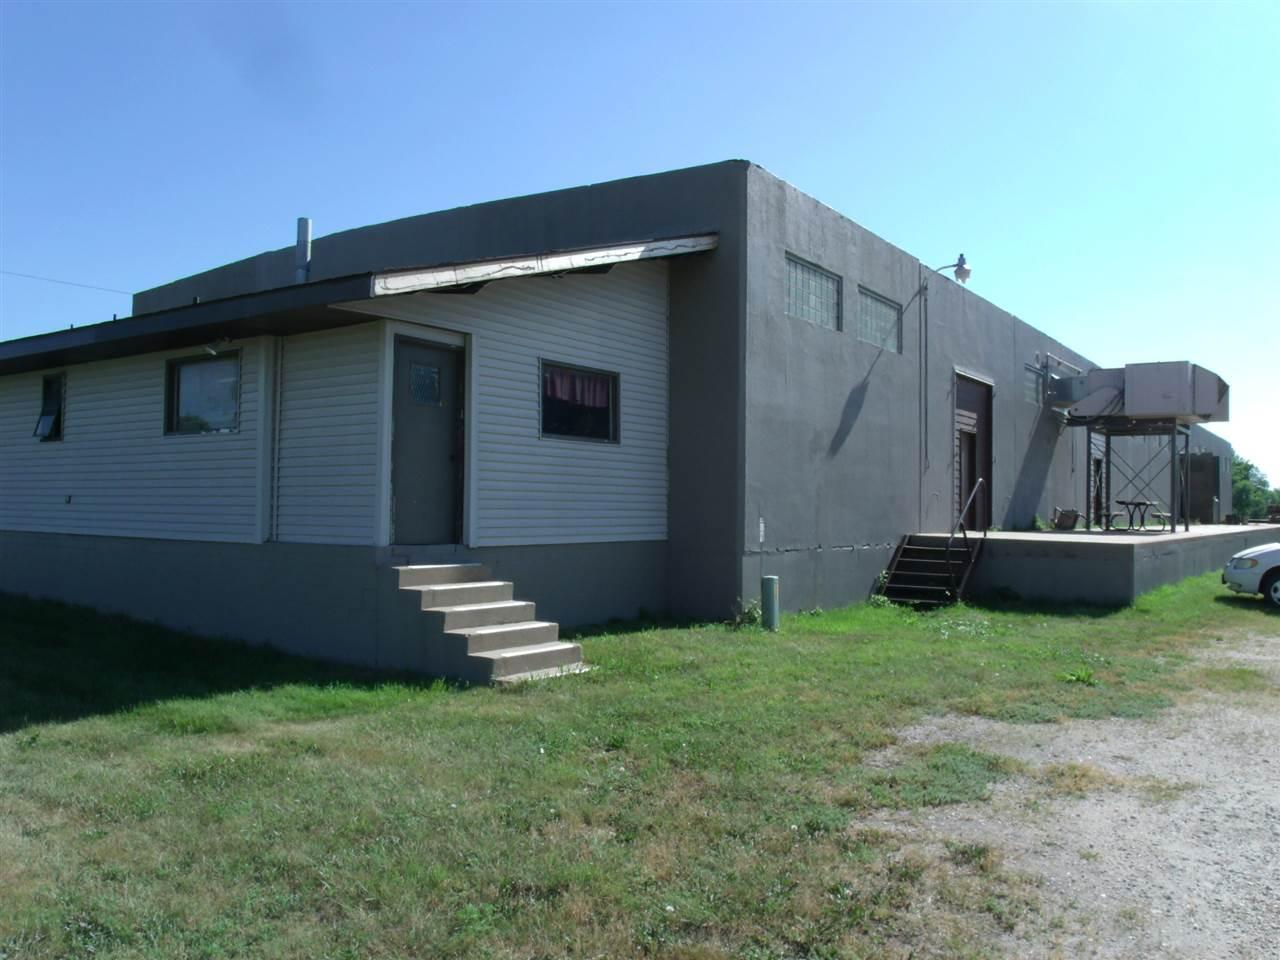 Real Estate for Sale, ListingId: 34436922, Hastings,NE68901